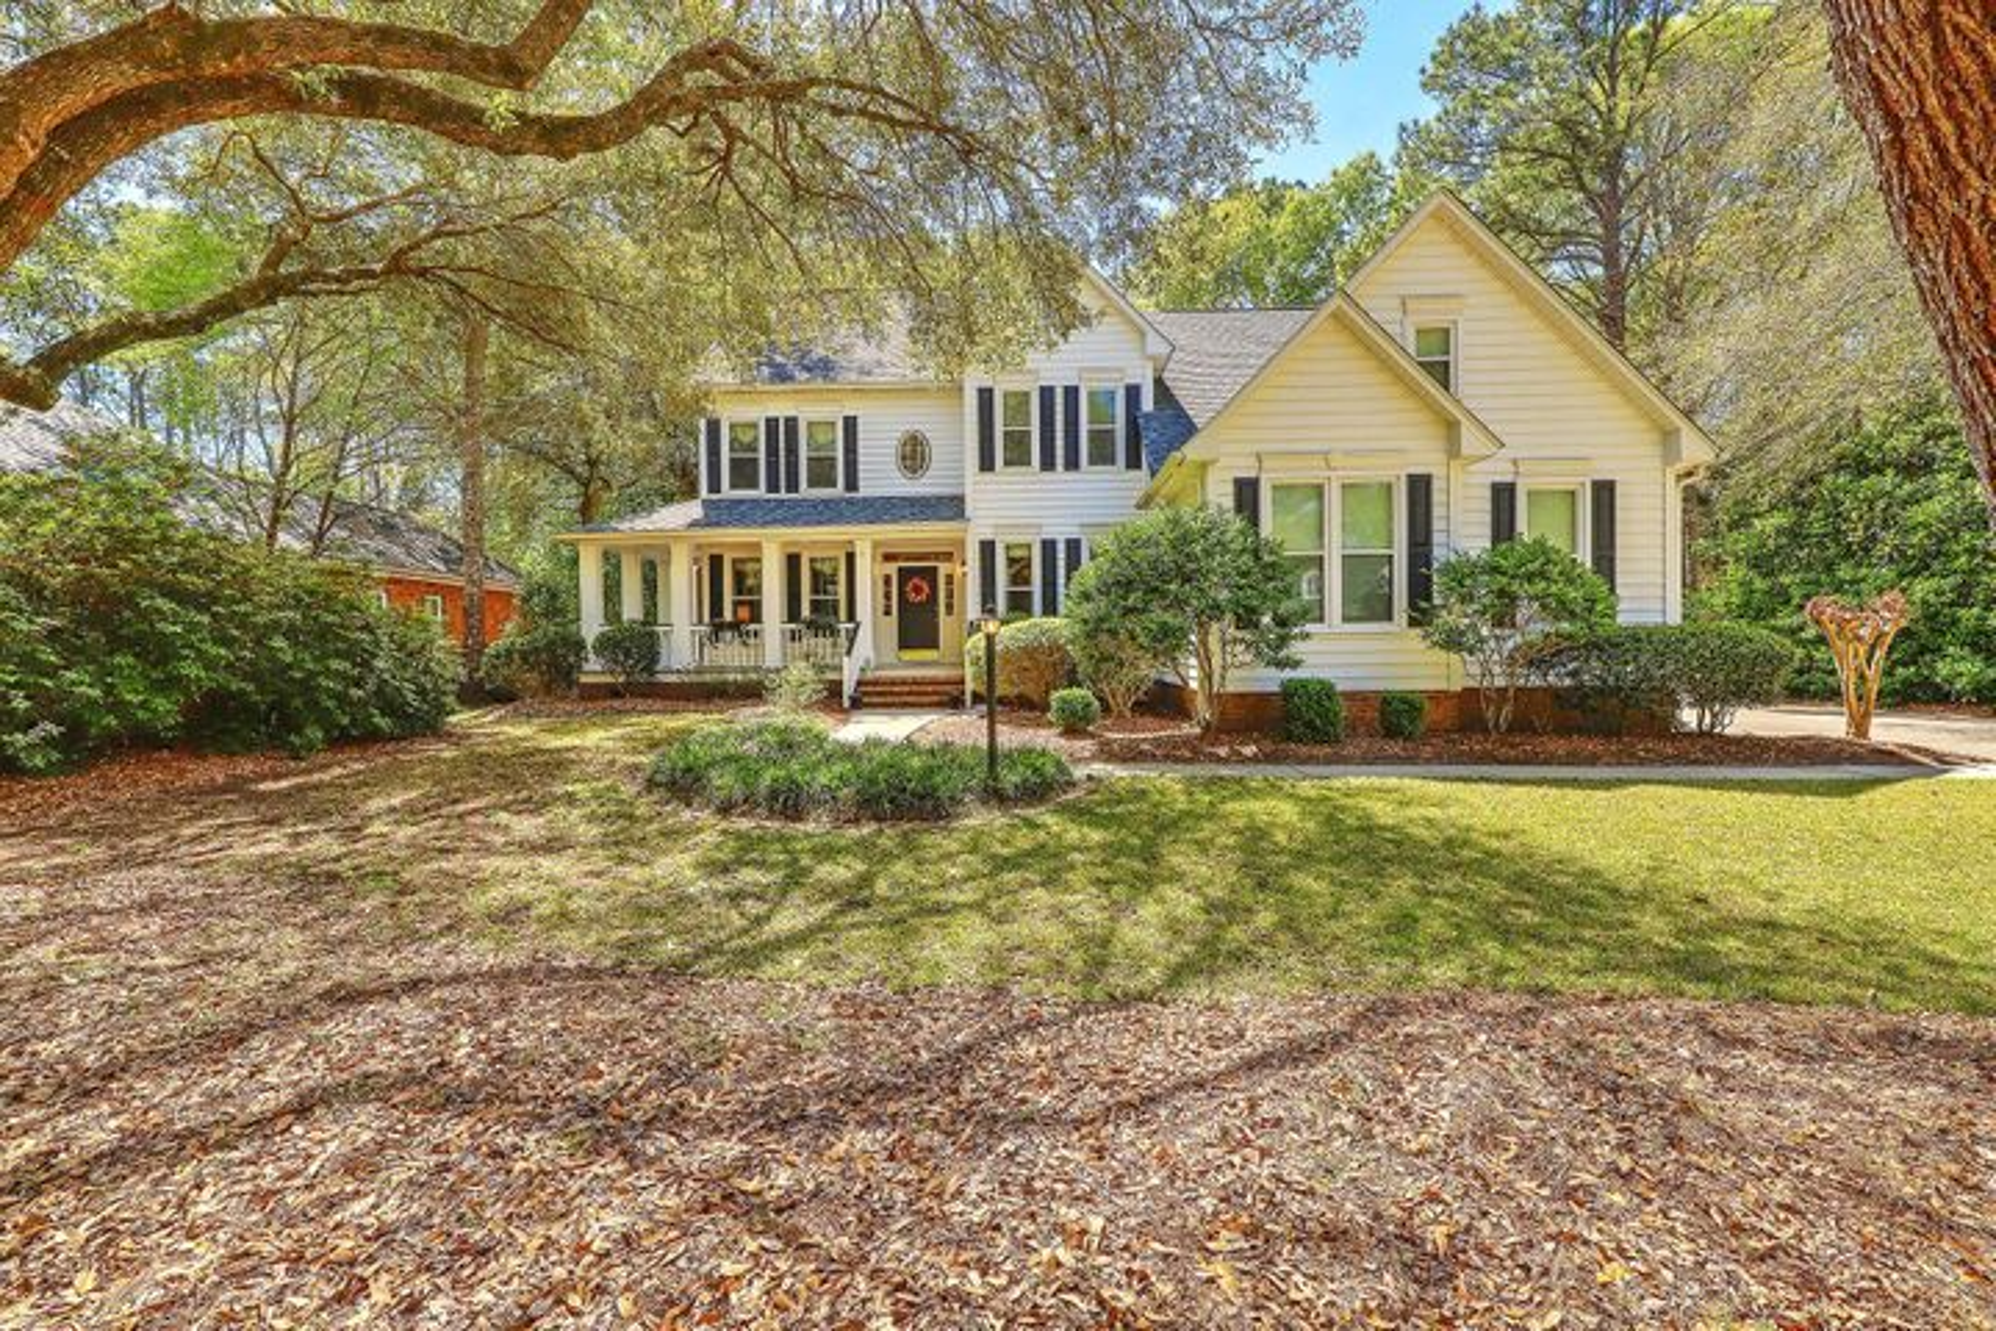 8611 Fairway Woods Drive, North Charleston, SC 29420